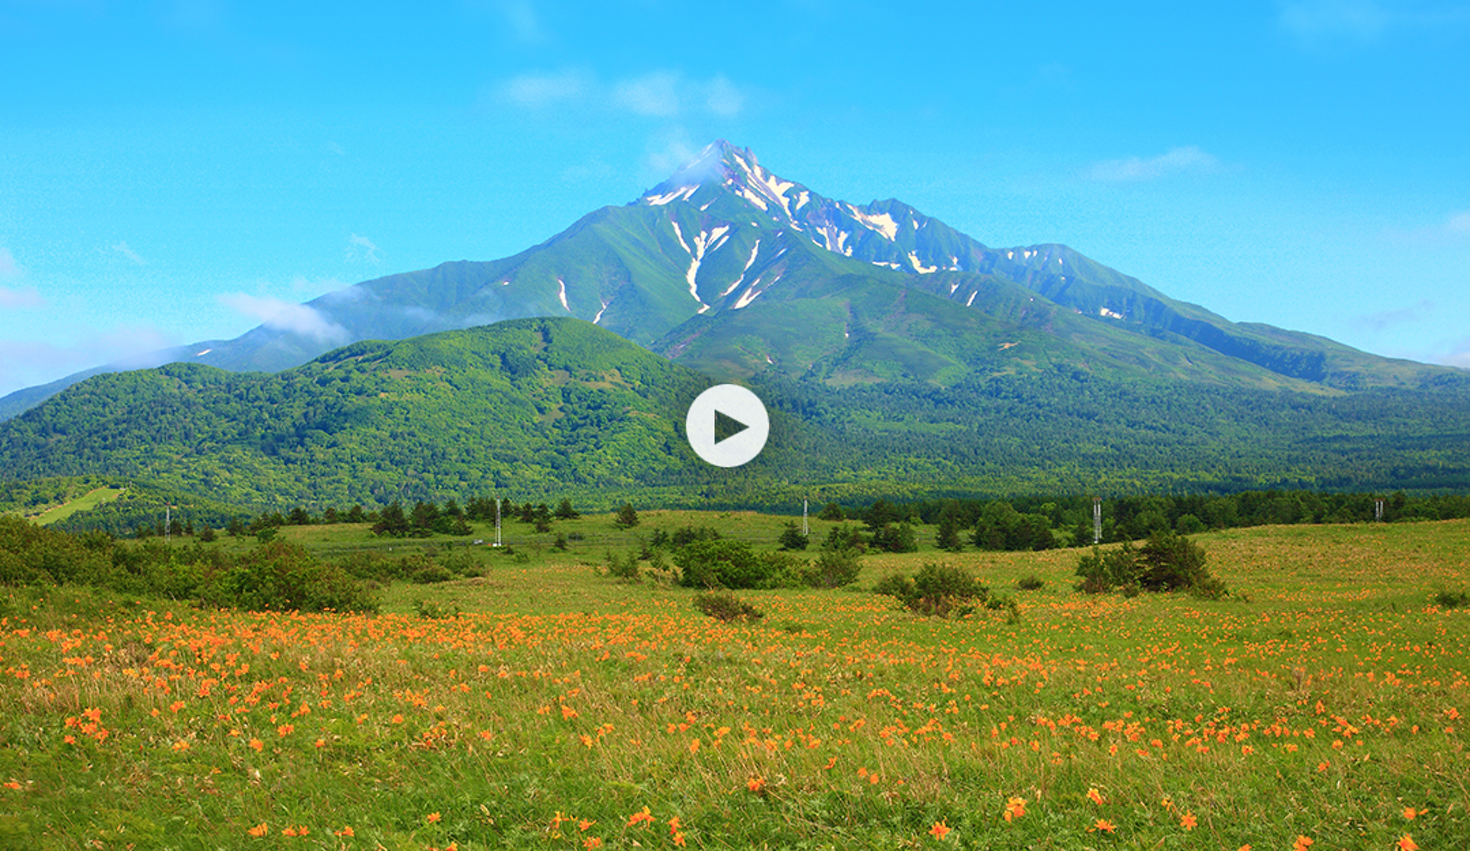 Mount Rishiri towers over a field of wildflowers off the coast of Hokkaidō, Japan © Seigo Yamamura / Getty Images